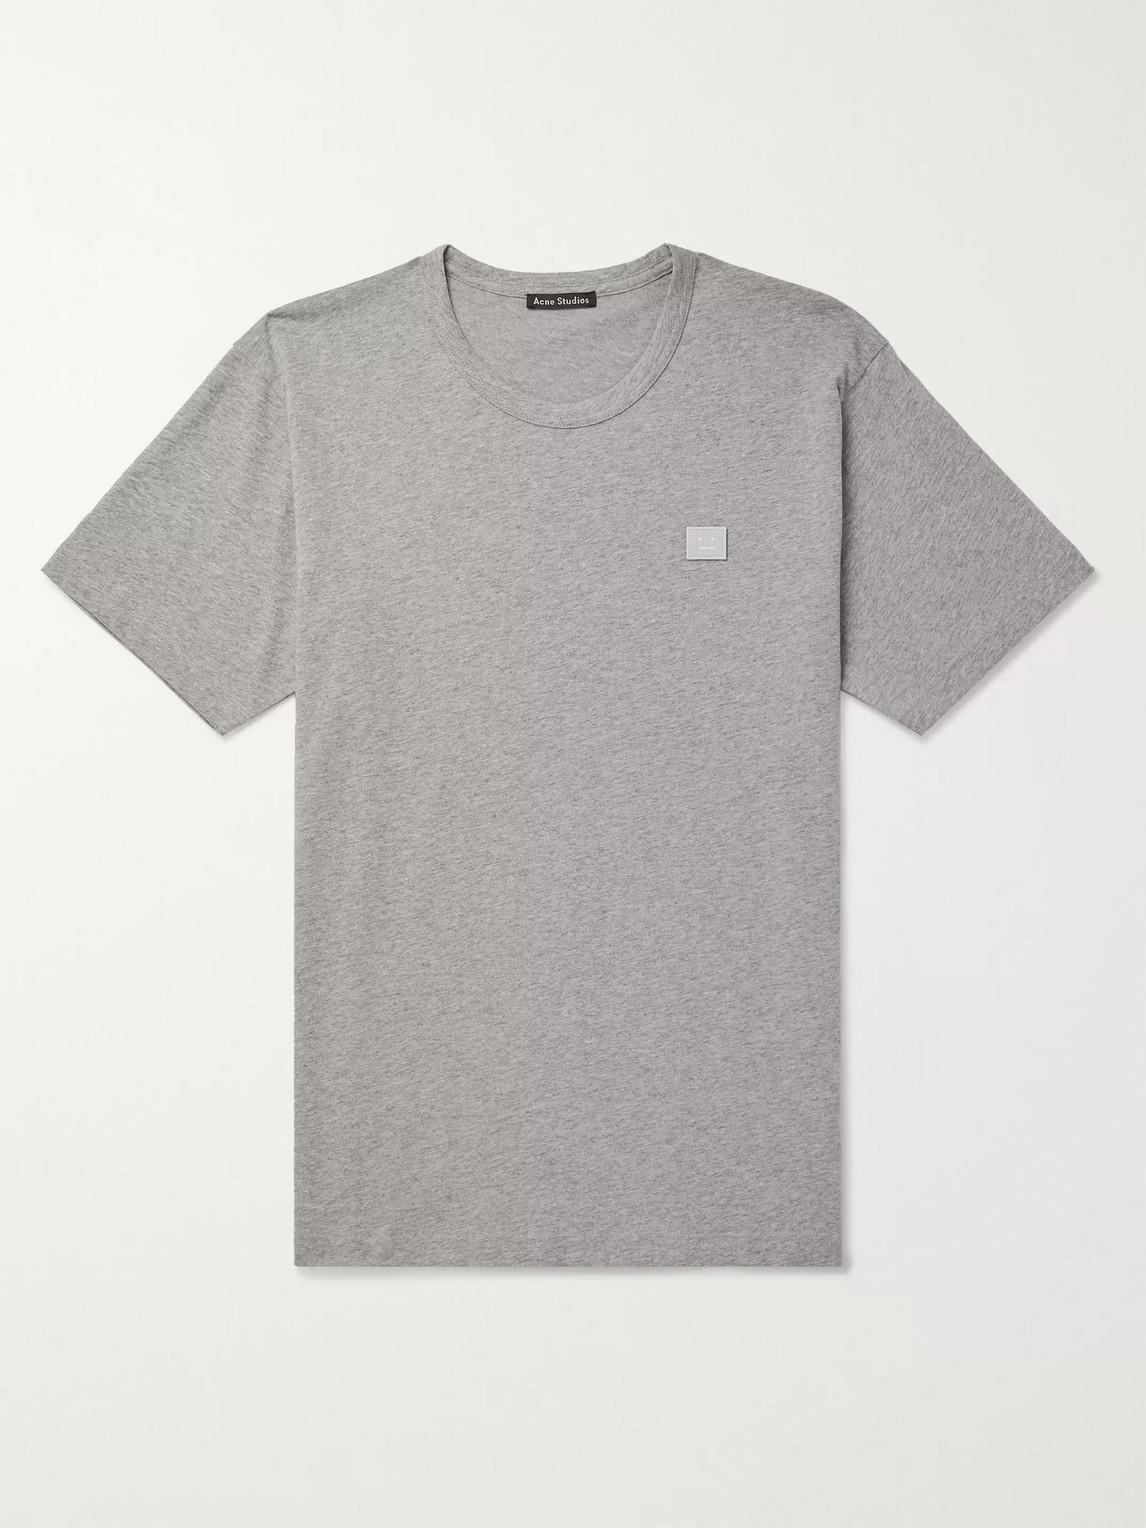 acne studios - nash logo-appliquã©d mã©lange cotton-jersey t-shirt - men - gray